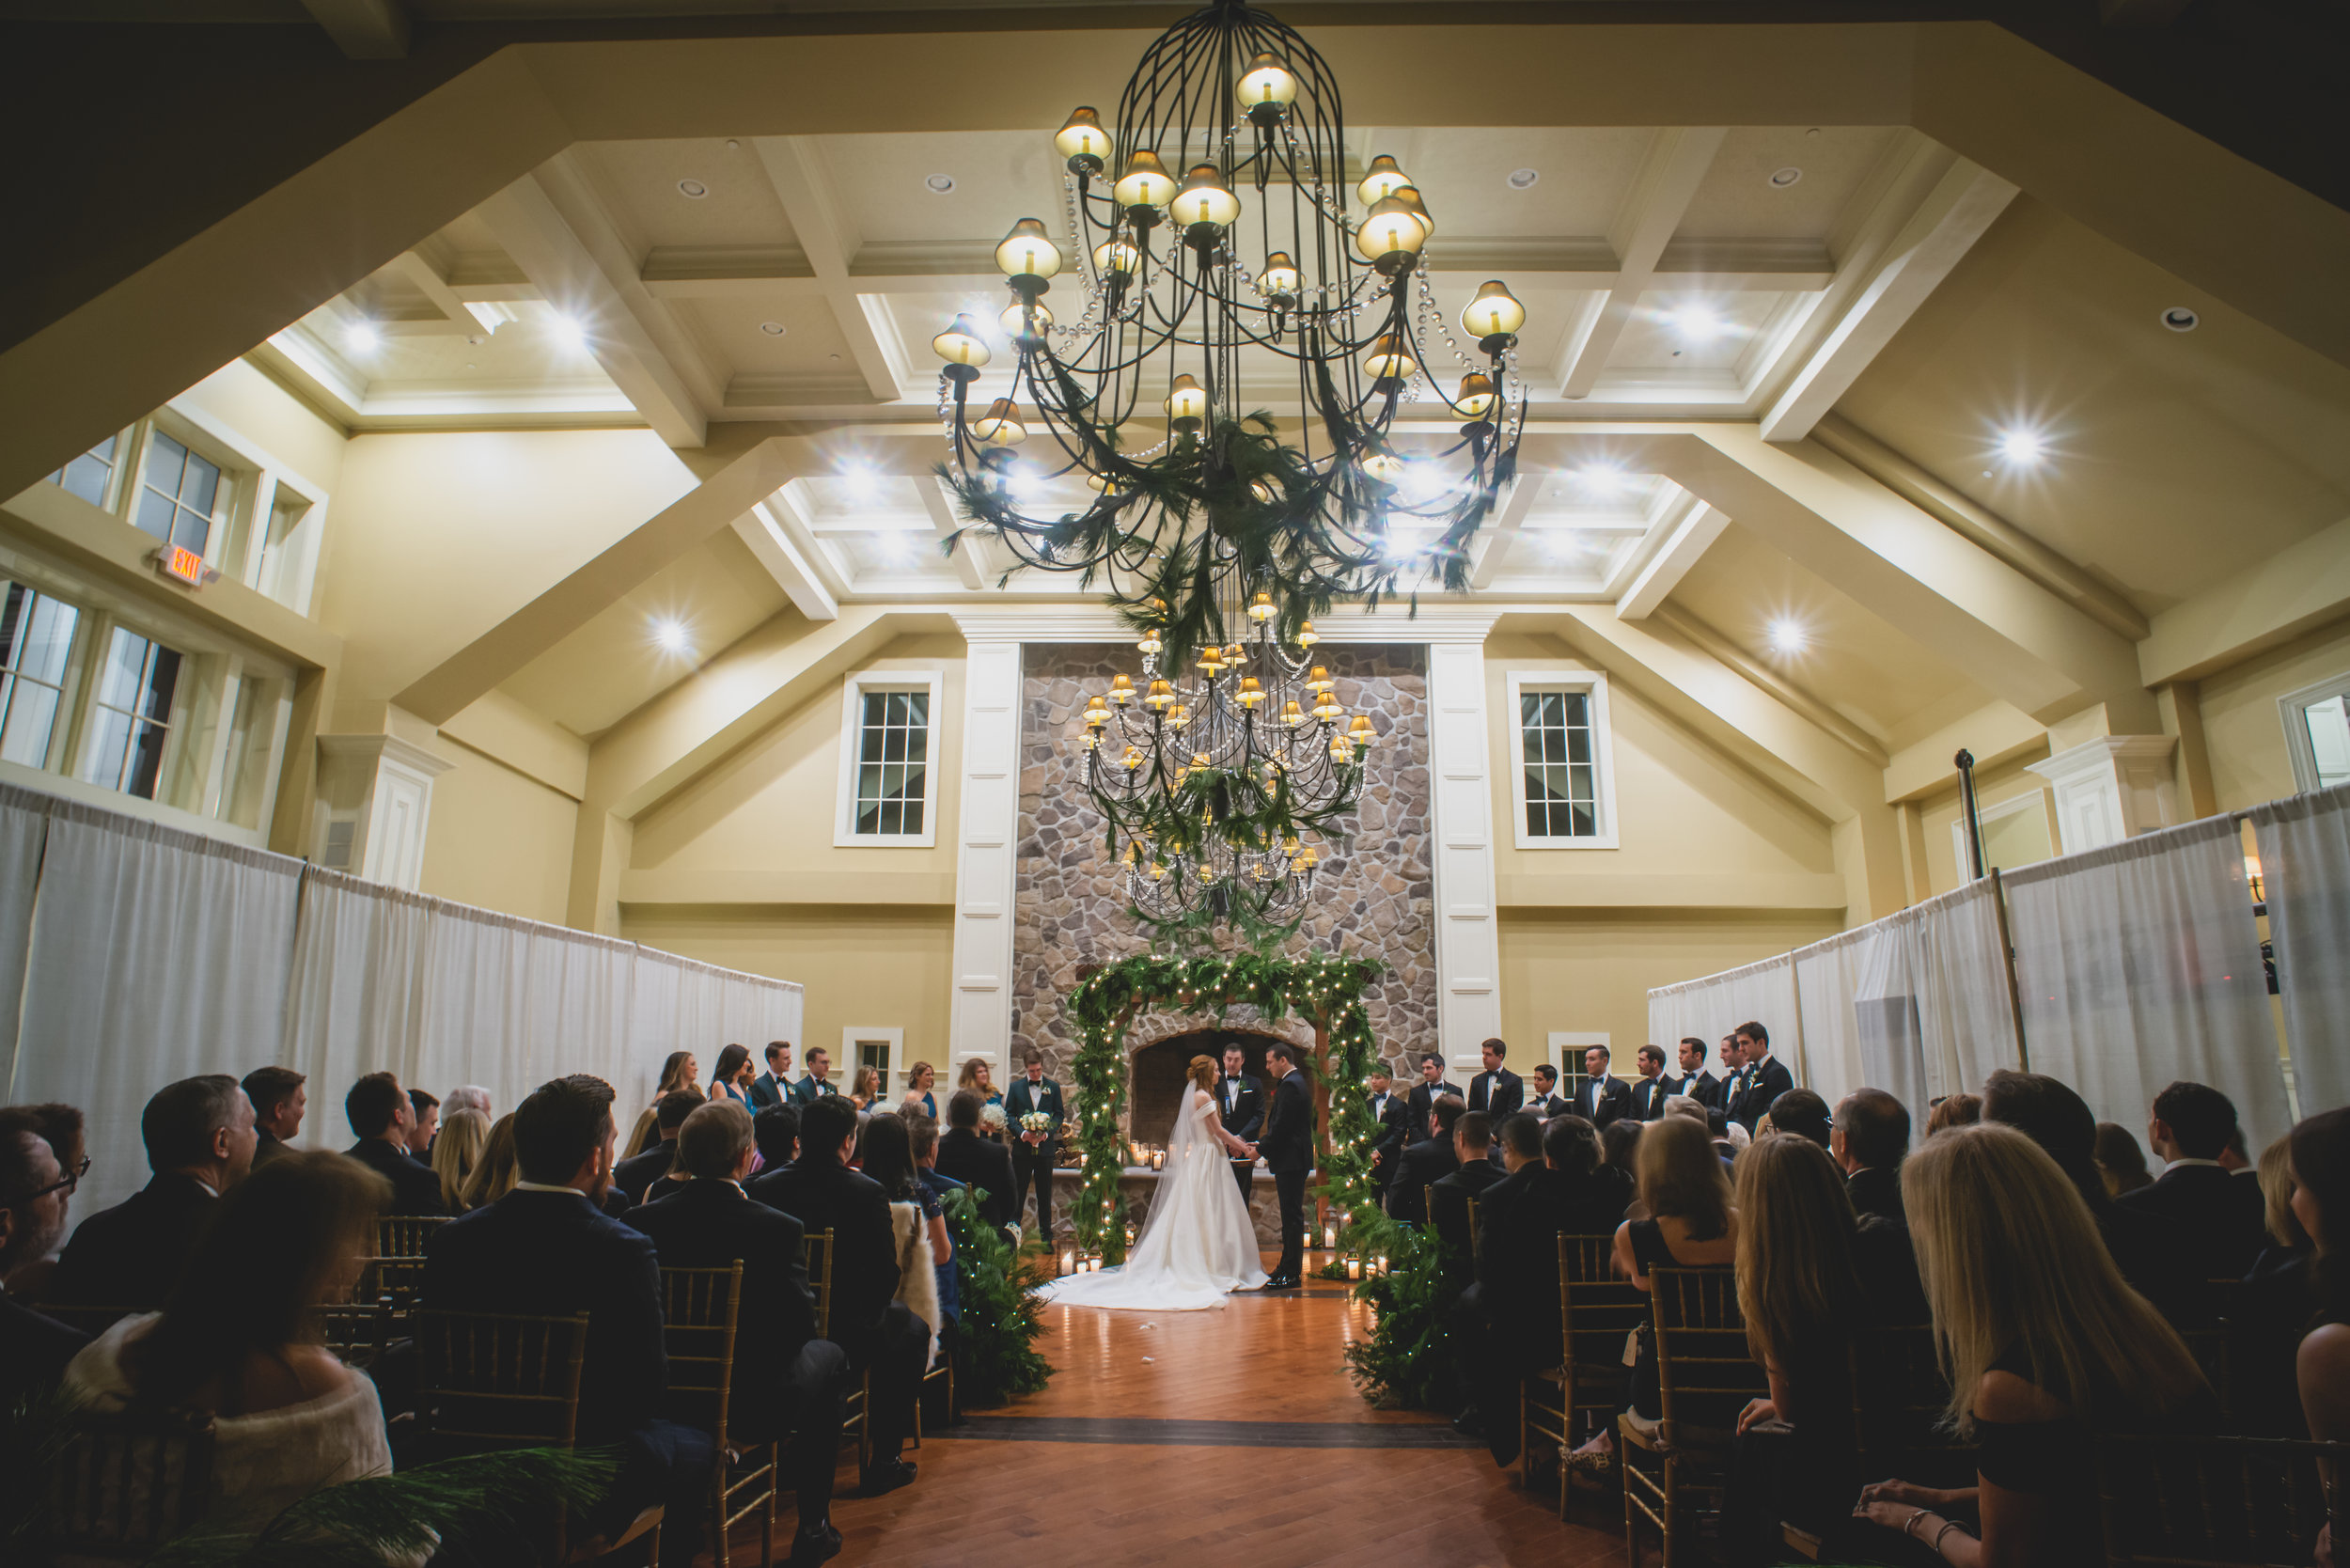 Whitehouse Station, NJ Wedding Venue - The Ryland Inn - Wedding Ceremony Photography